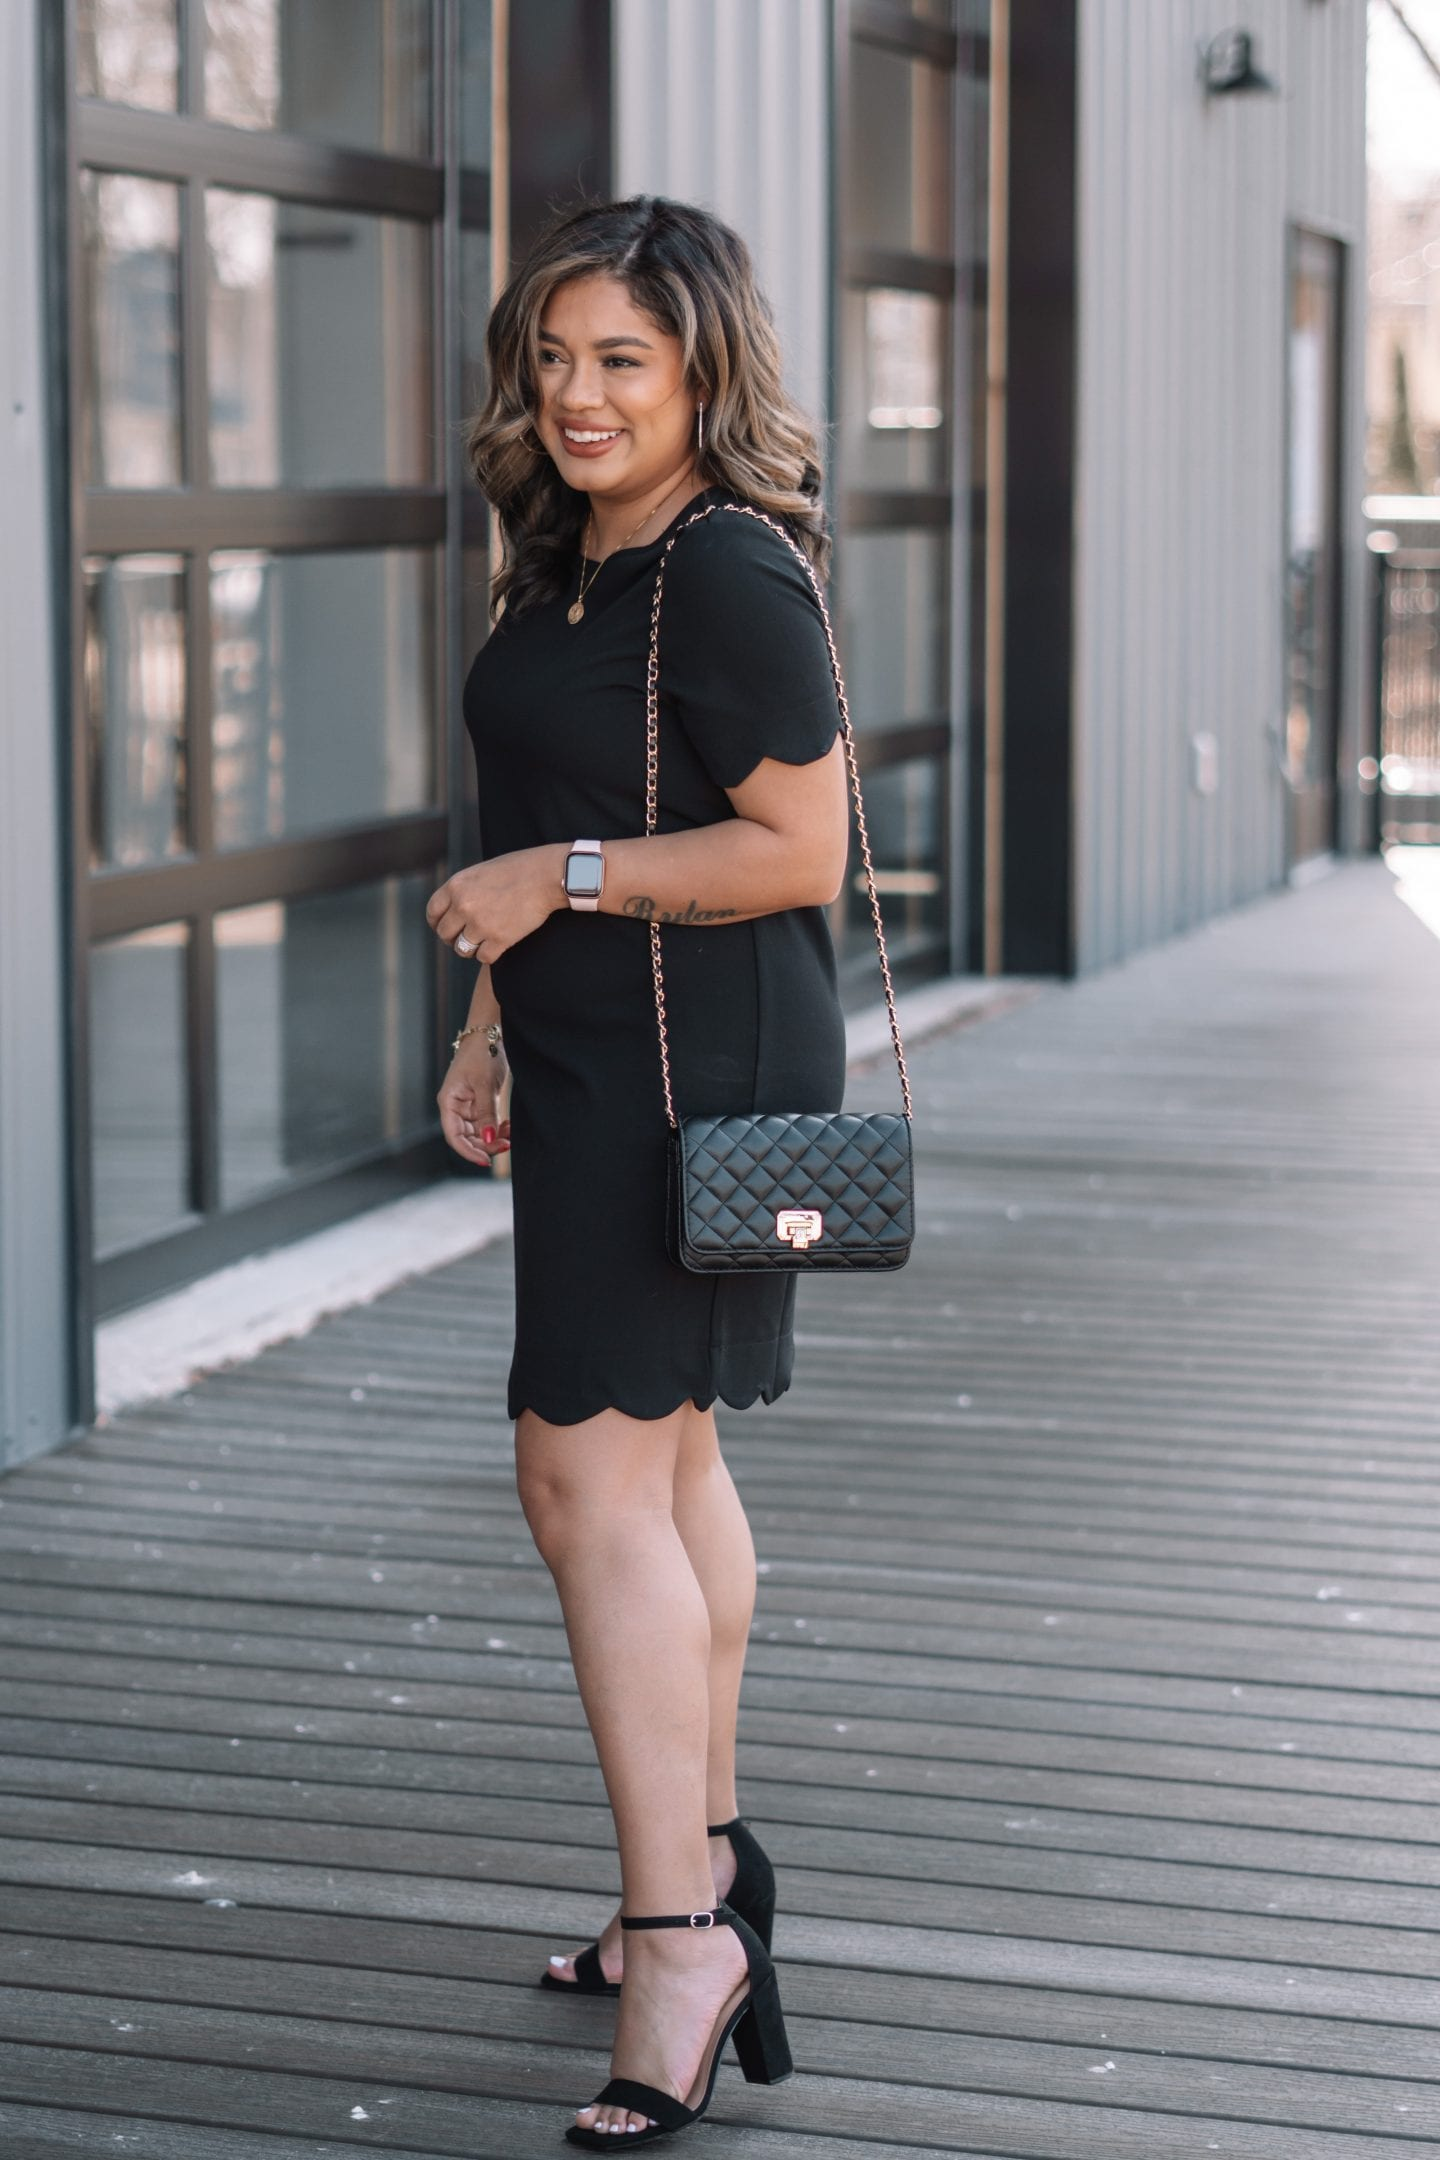 Black Cocktail Dresses